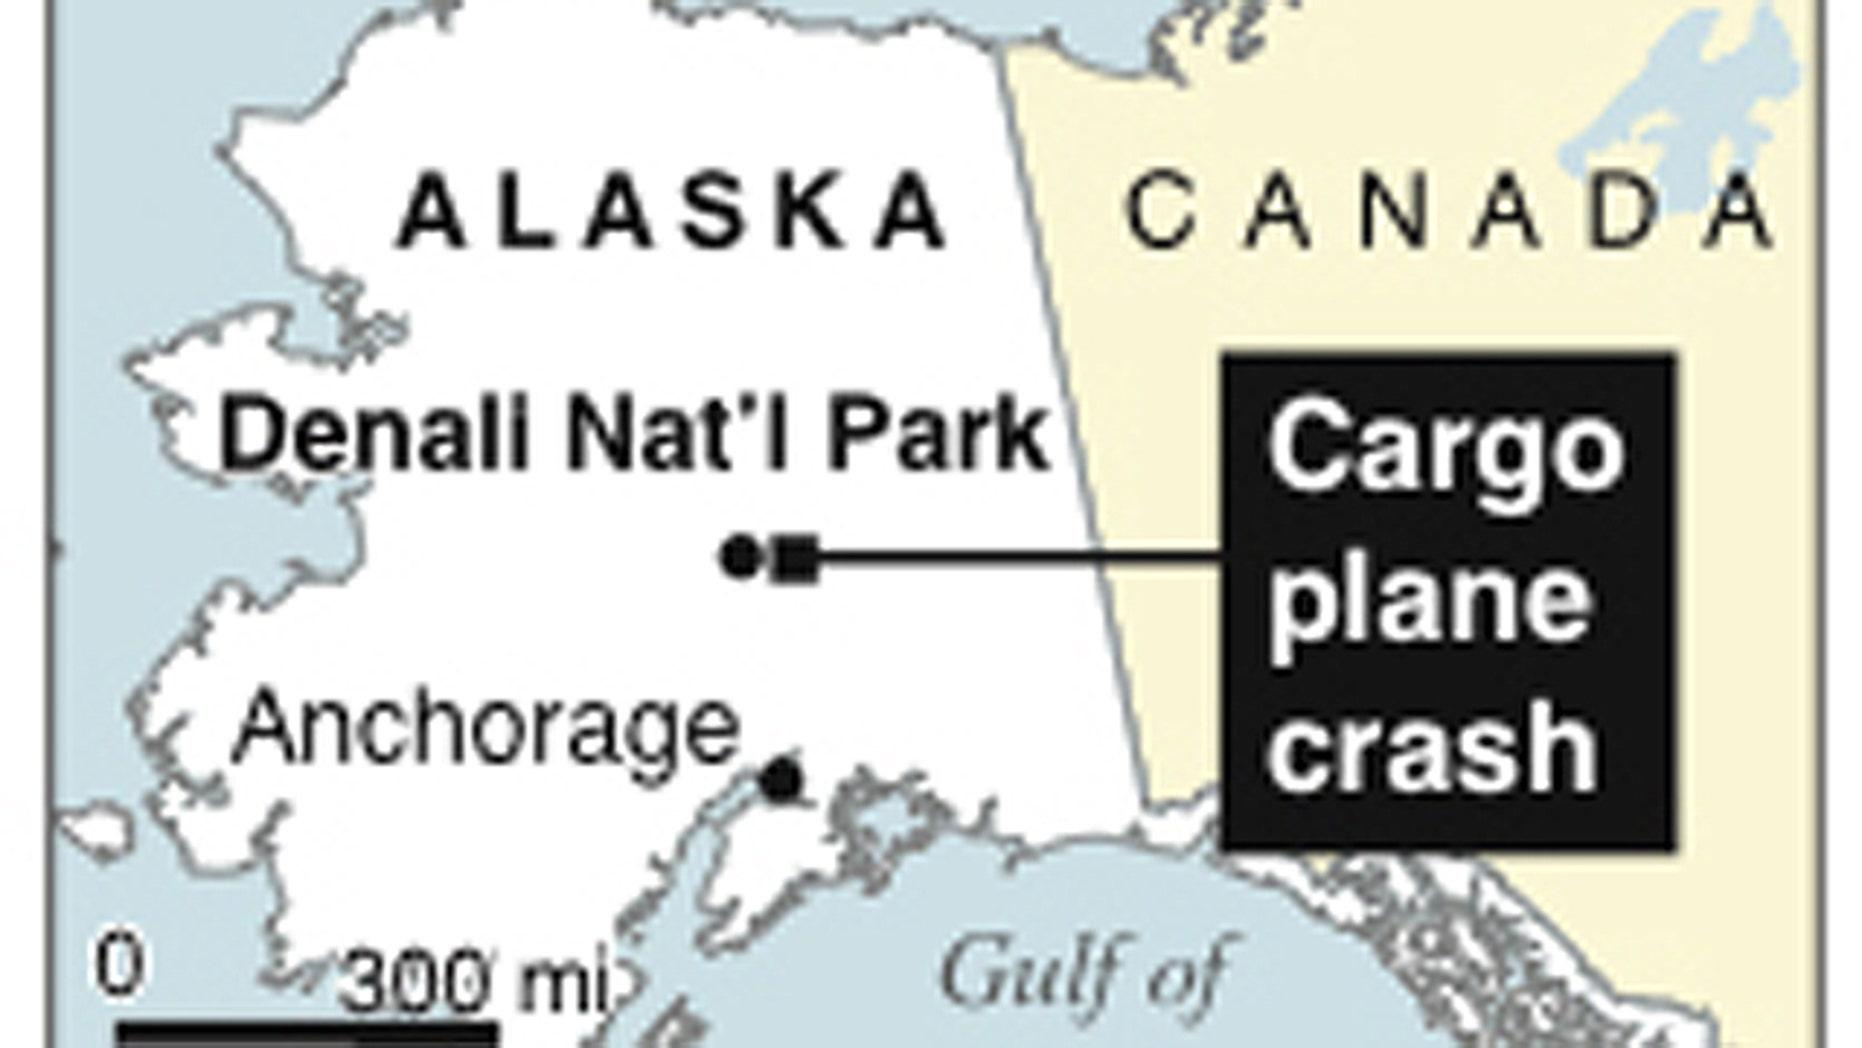 Map locates cargo plane crash near Denali National Park in Alaska